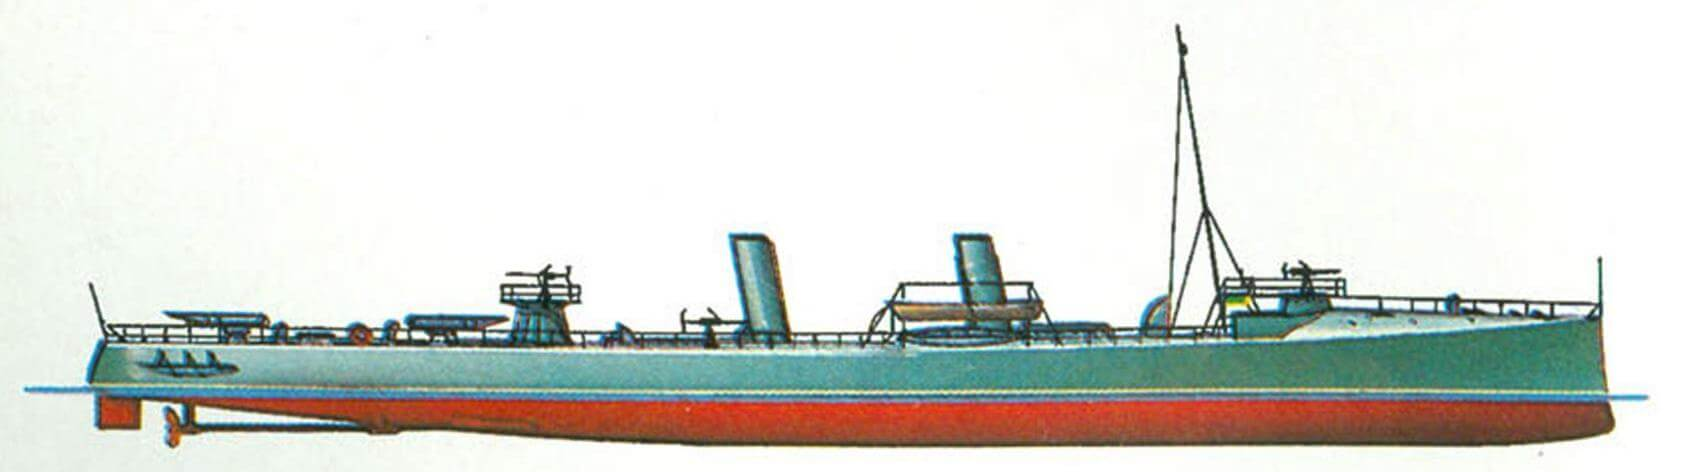 147. Эскадренный миноносец «ФАРРАГАТ», США, 1899 г.